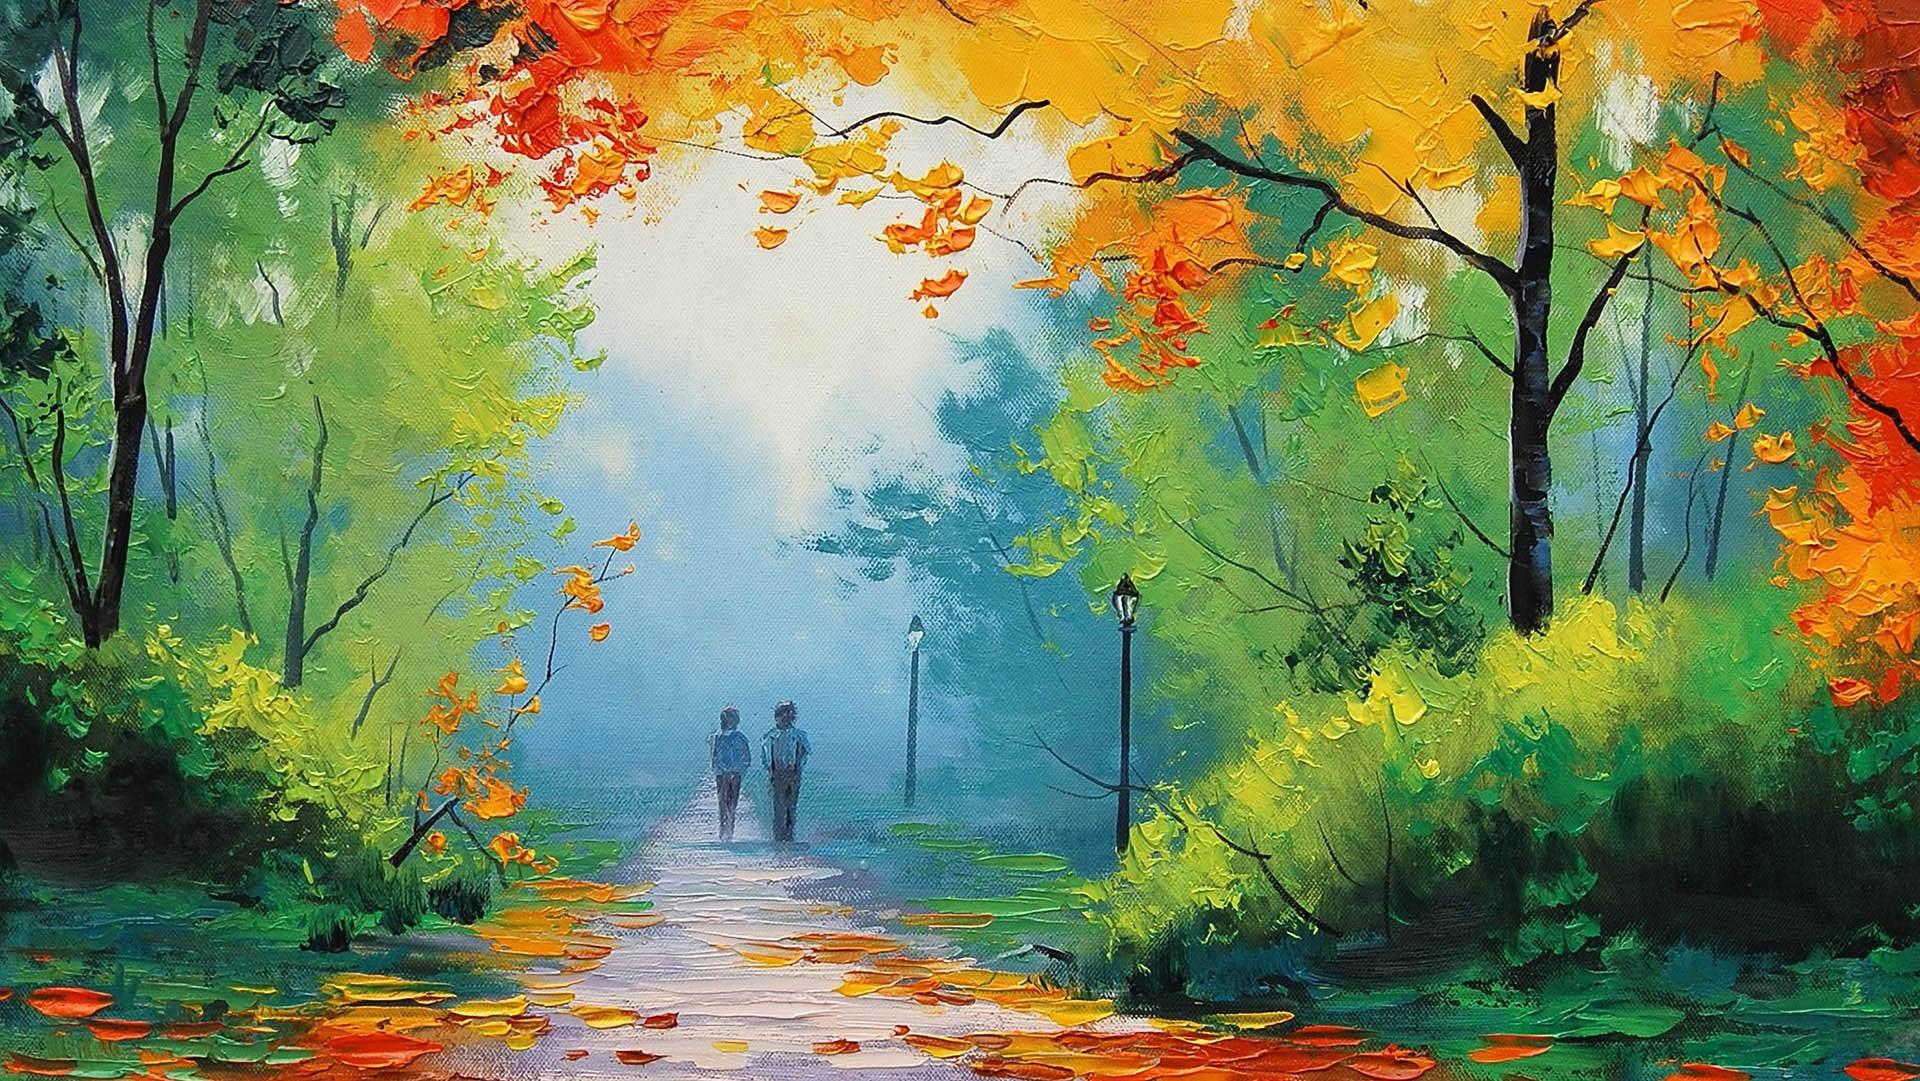 love painting wallpaper hd,natural landscape,painting,nature,watercolor paint,acrylic paint